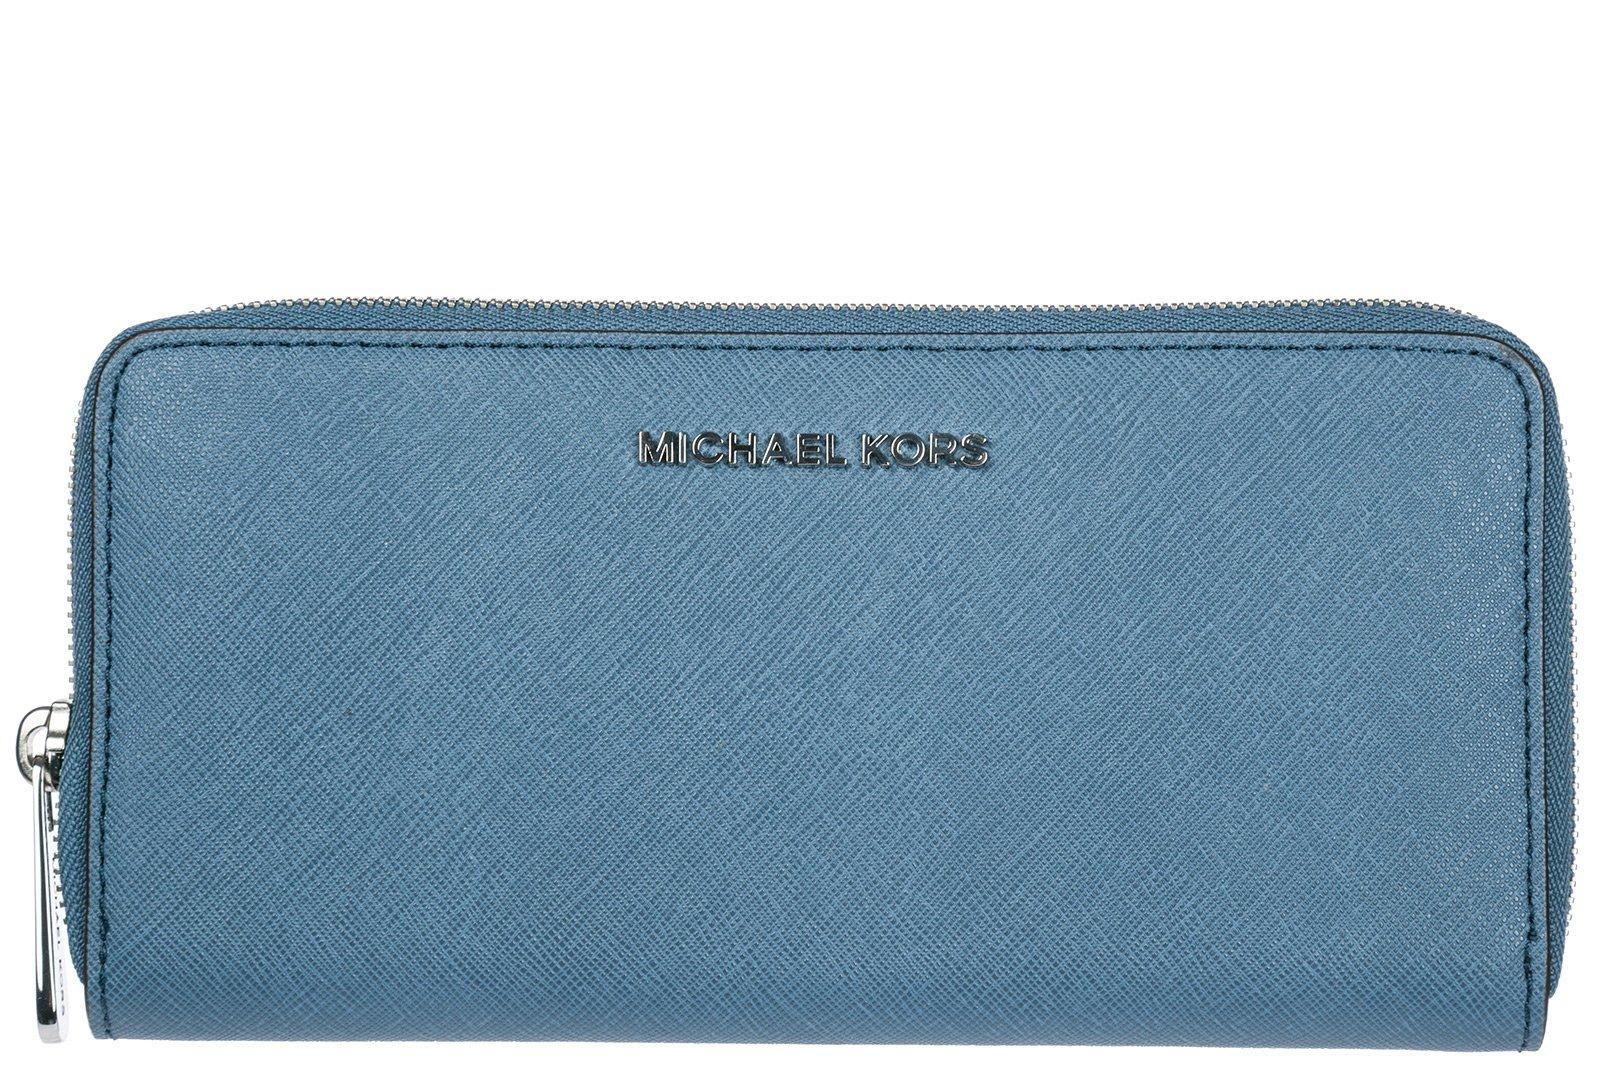 Michael Kors women's wallet coin case holder purse card bifold jet set travel za